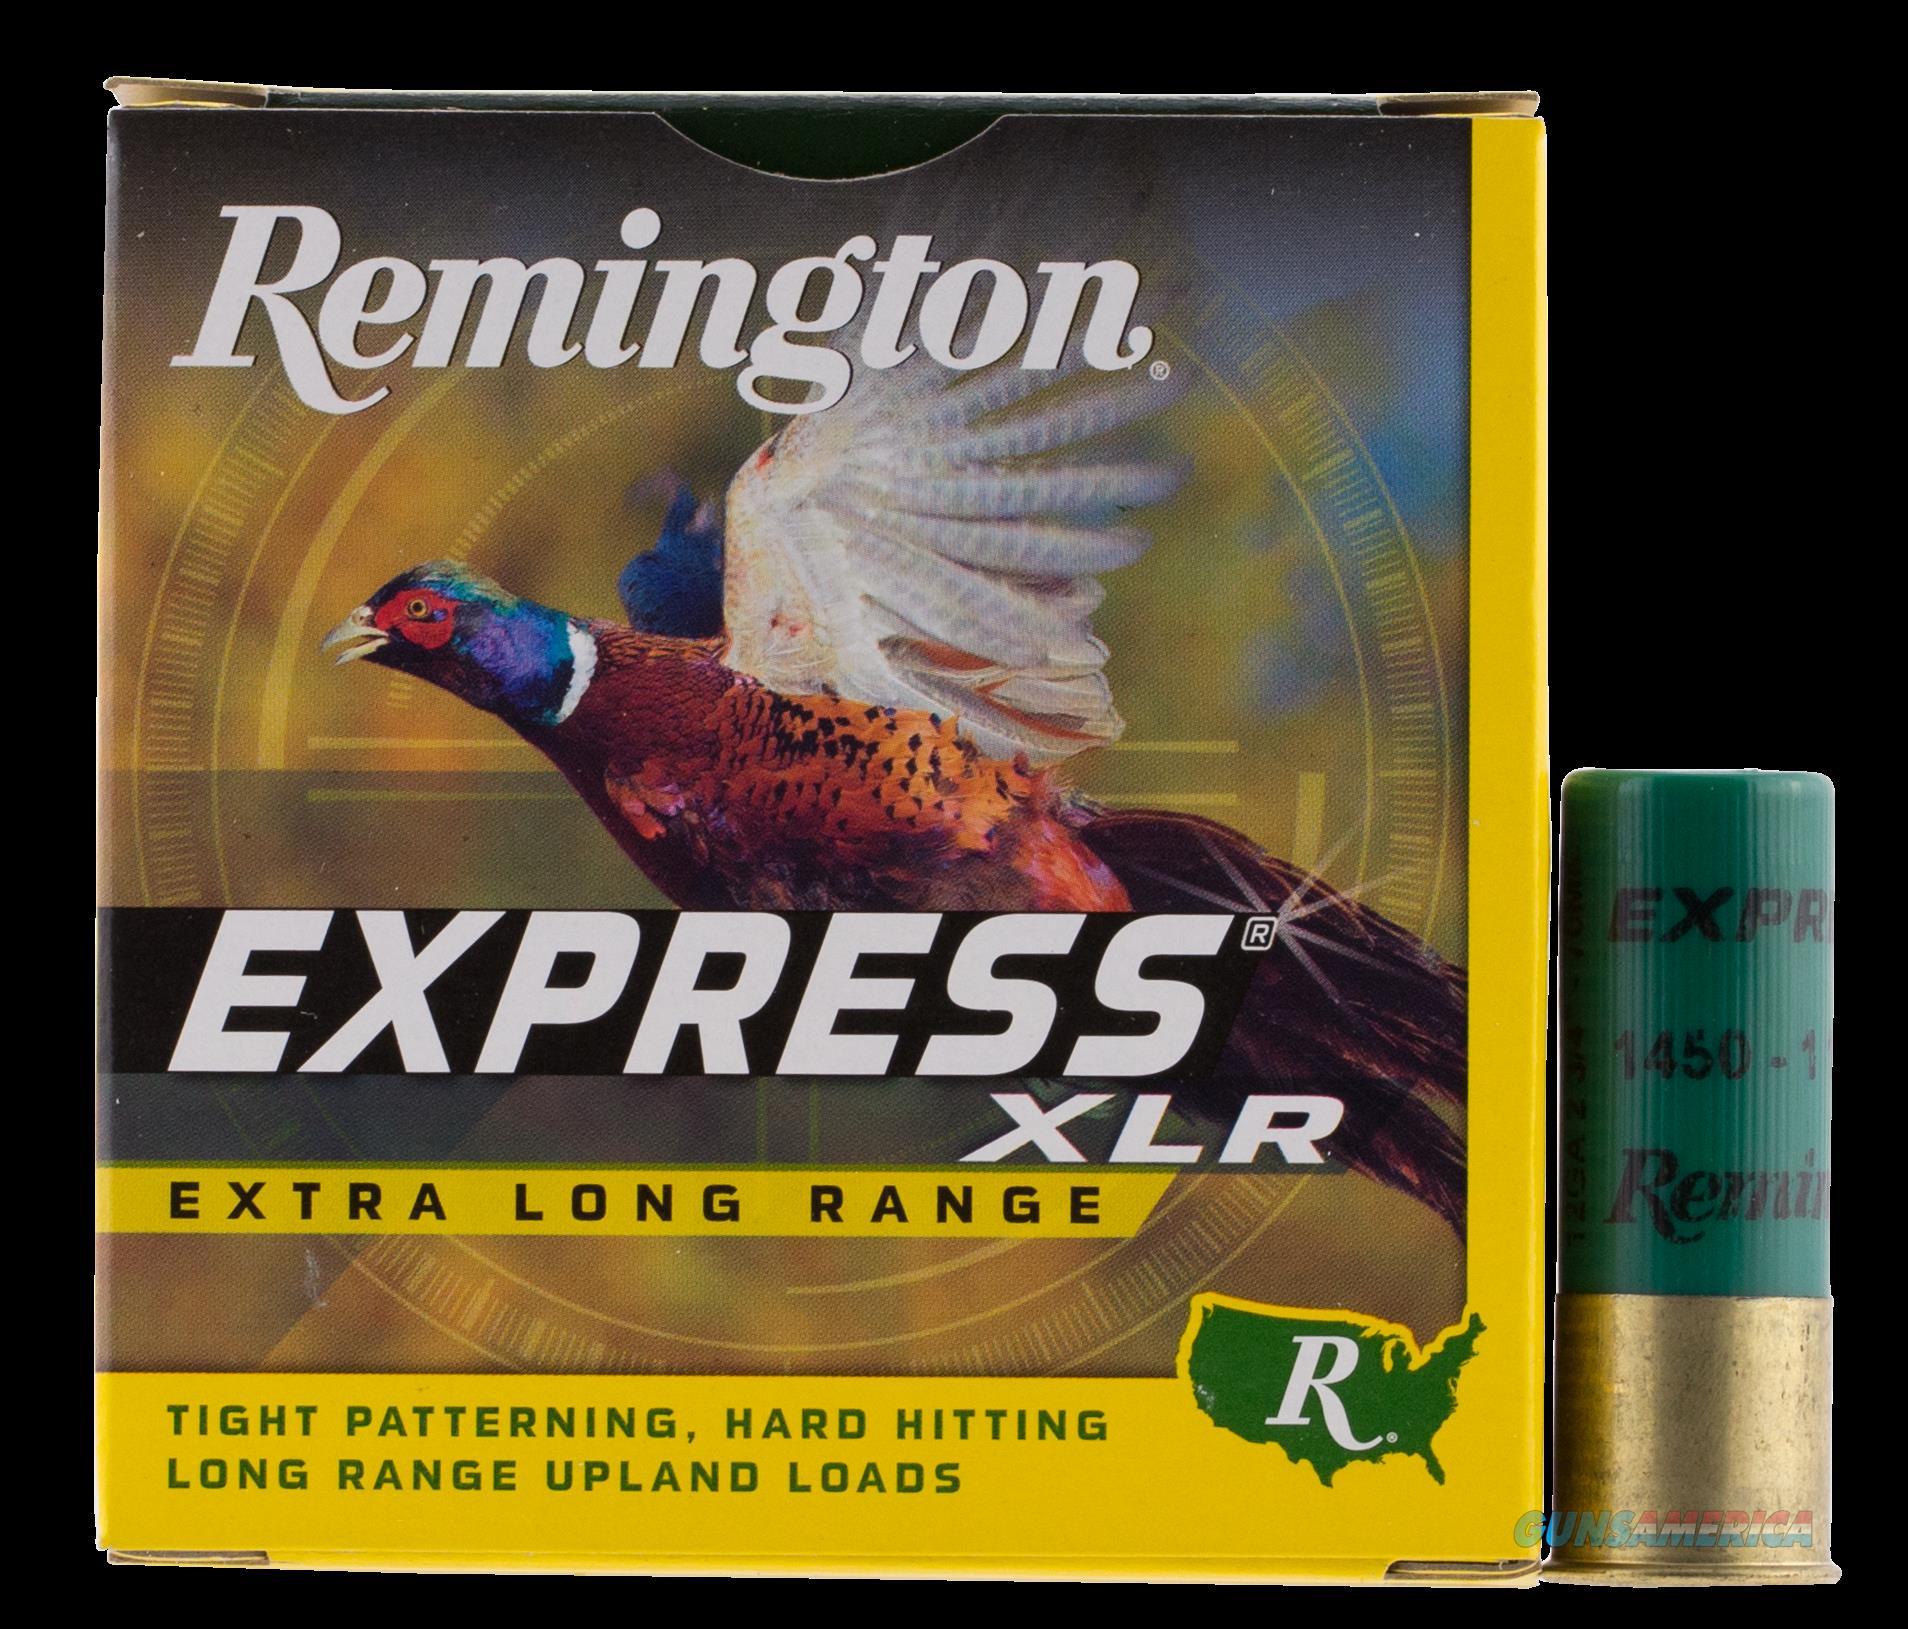 Remington Ammunition Express Xlr, Rem 20167 Nehv125  12  Extra Long Rng  25-10  Guns > Pistols > 1911 Pistol Copies (non-Colt)